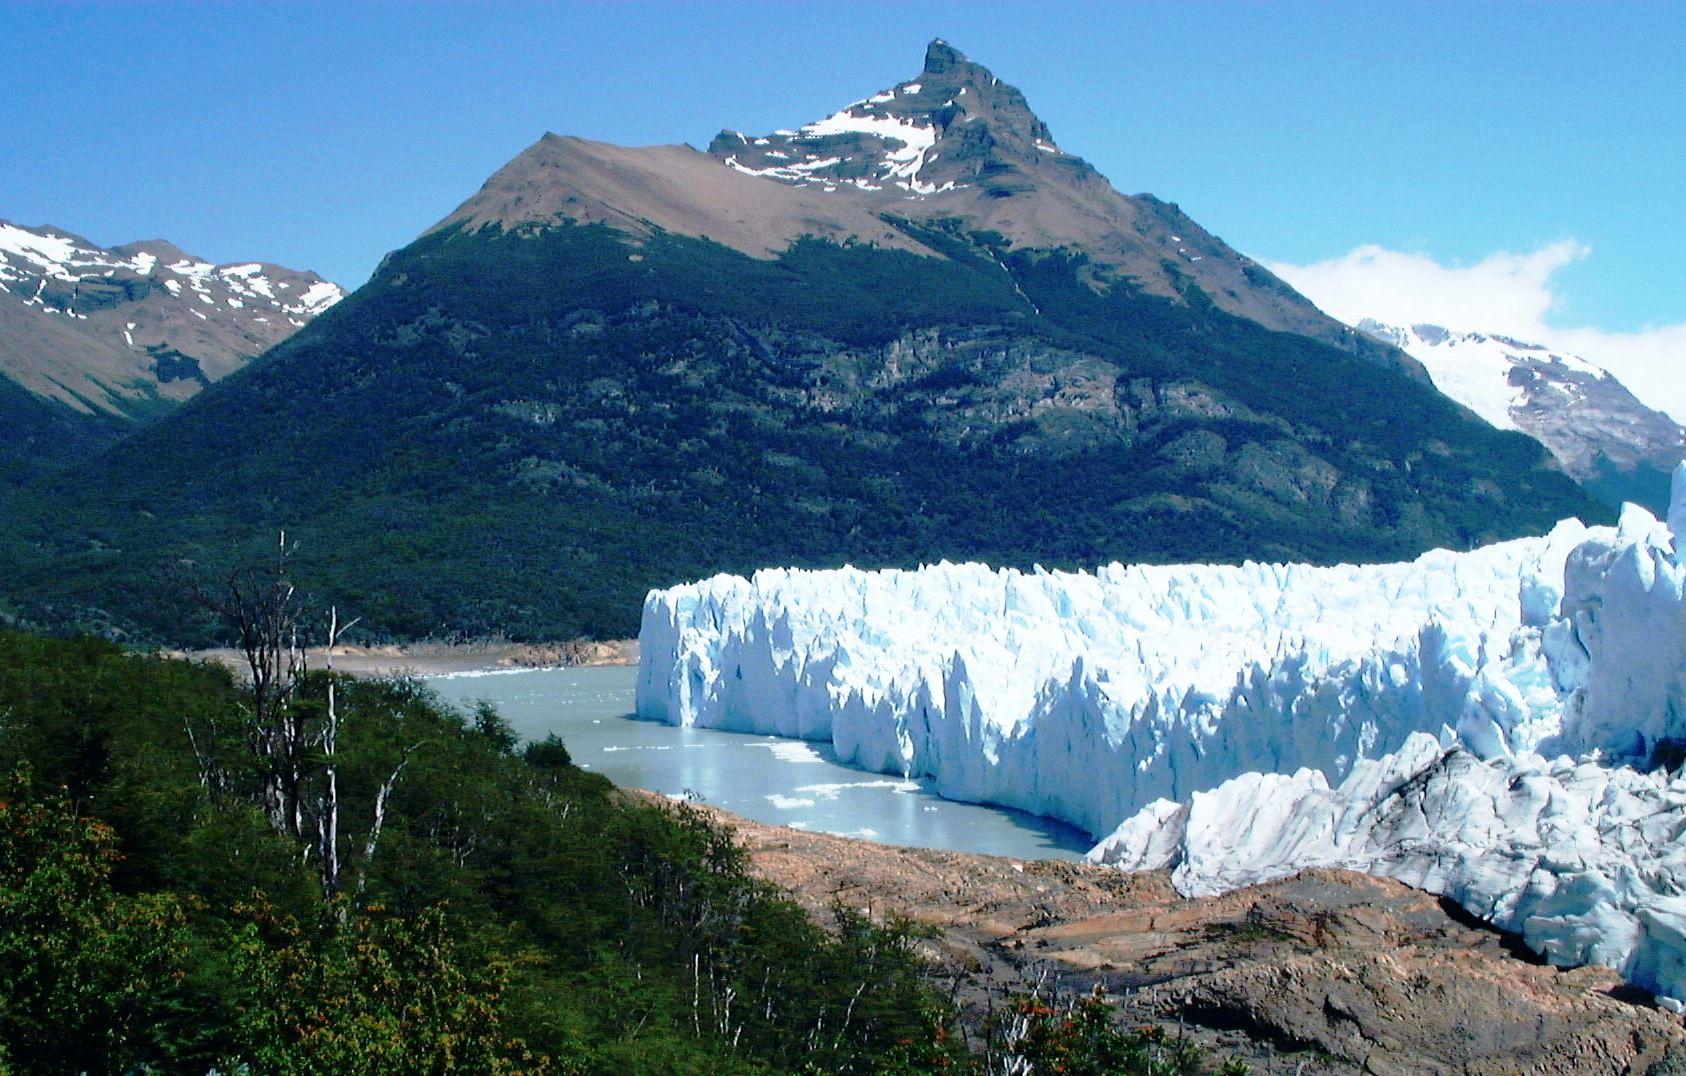 patagonia - photo #1